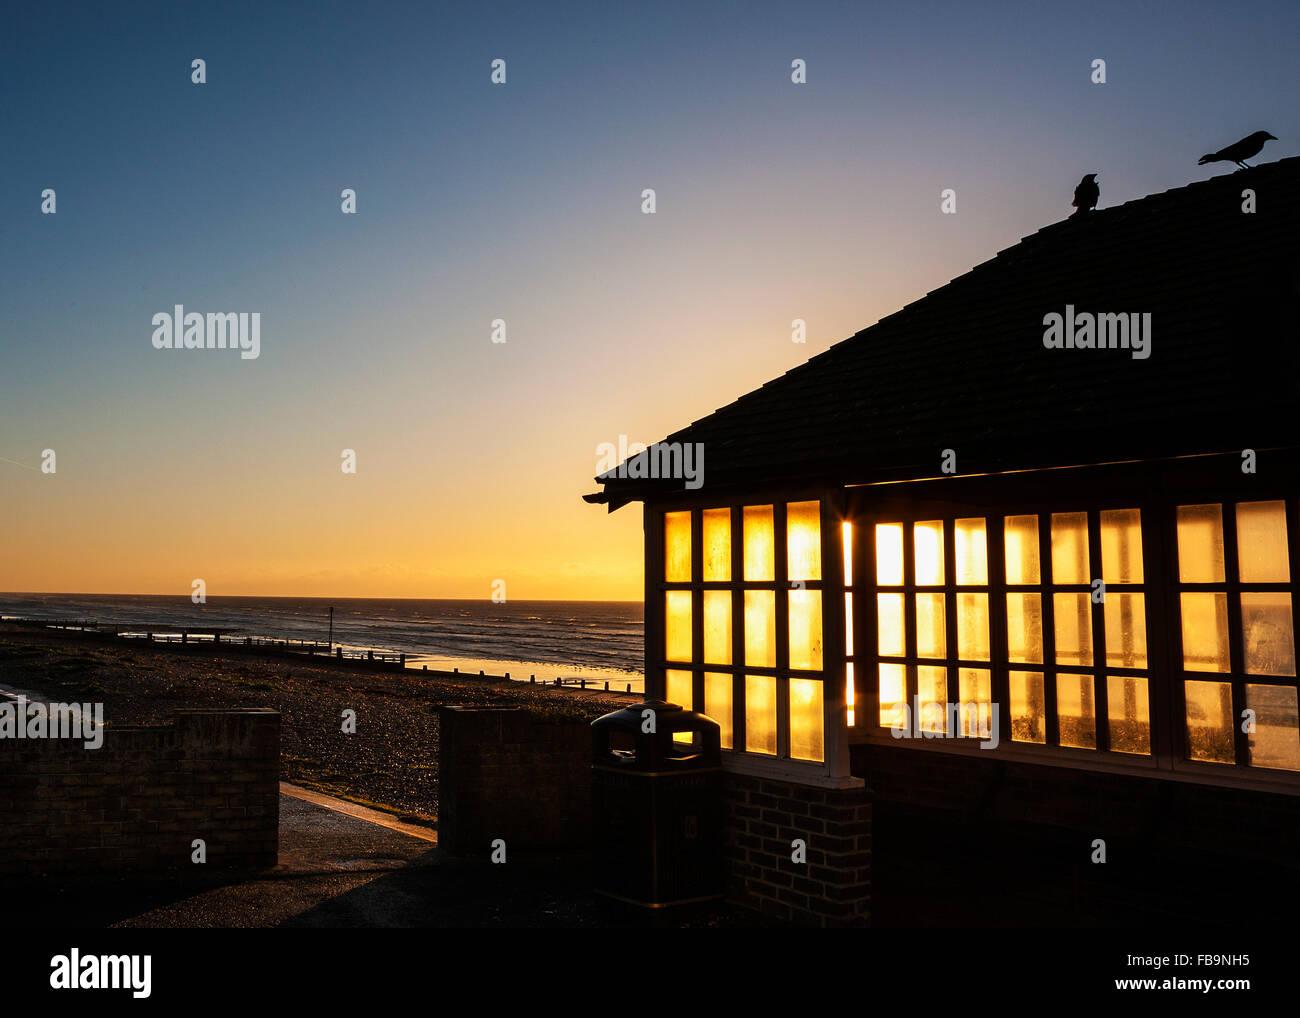 Sunrise through windows of beach shelter - Stock Image